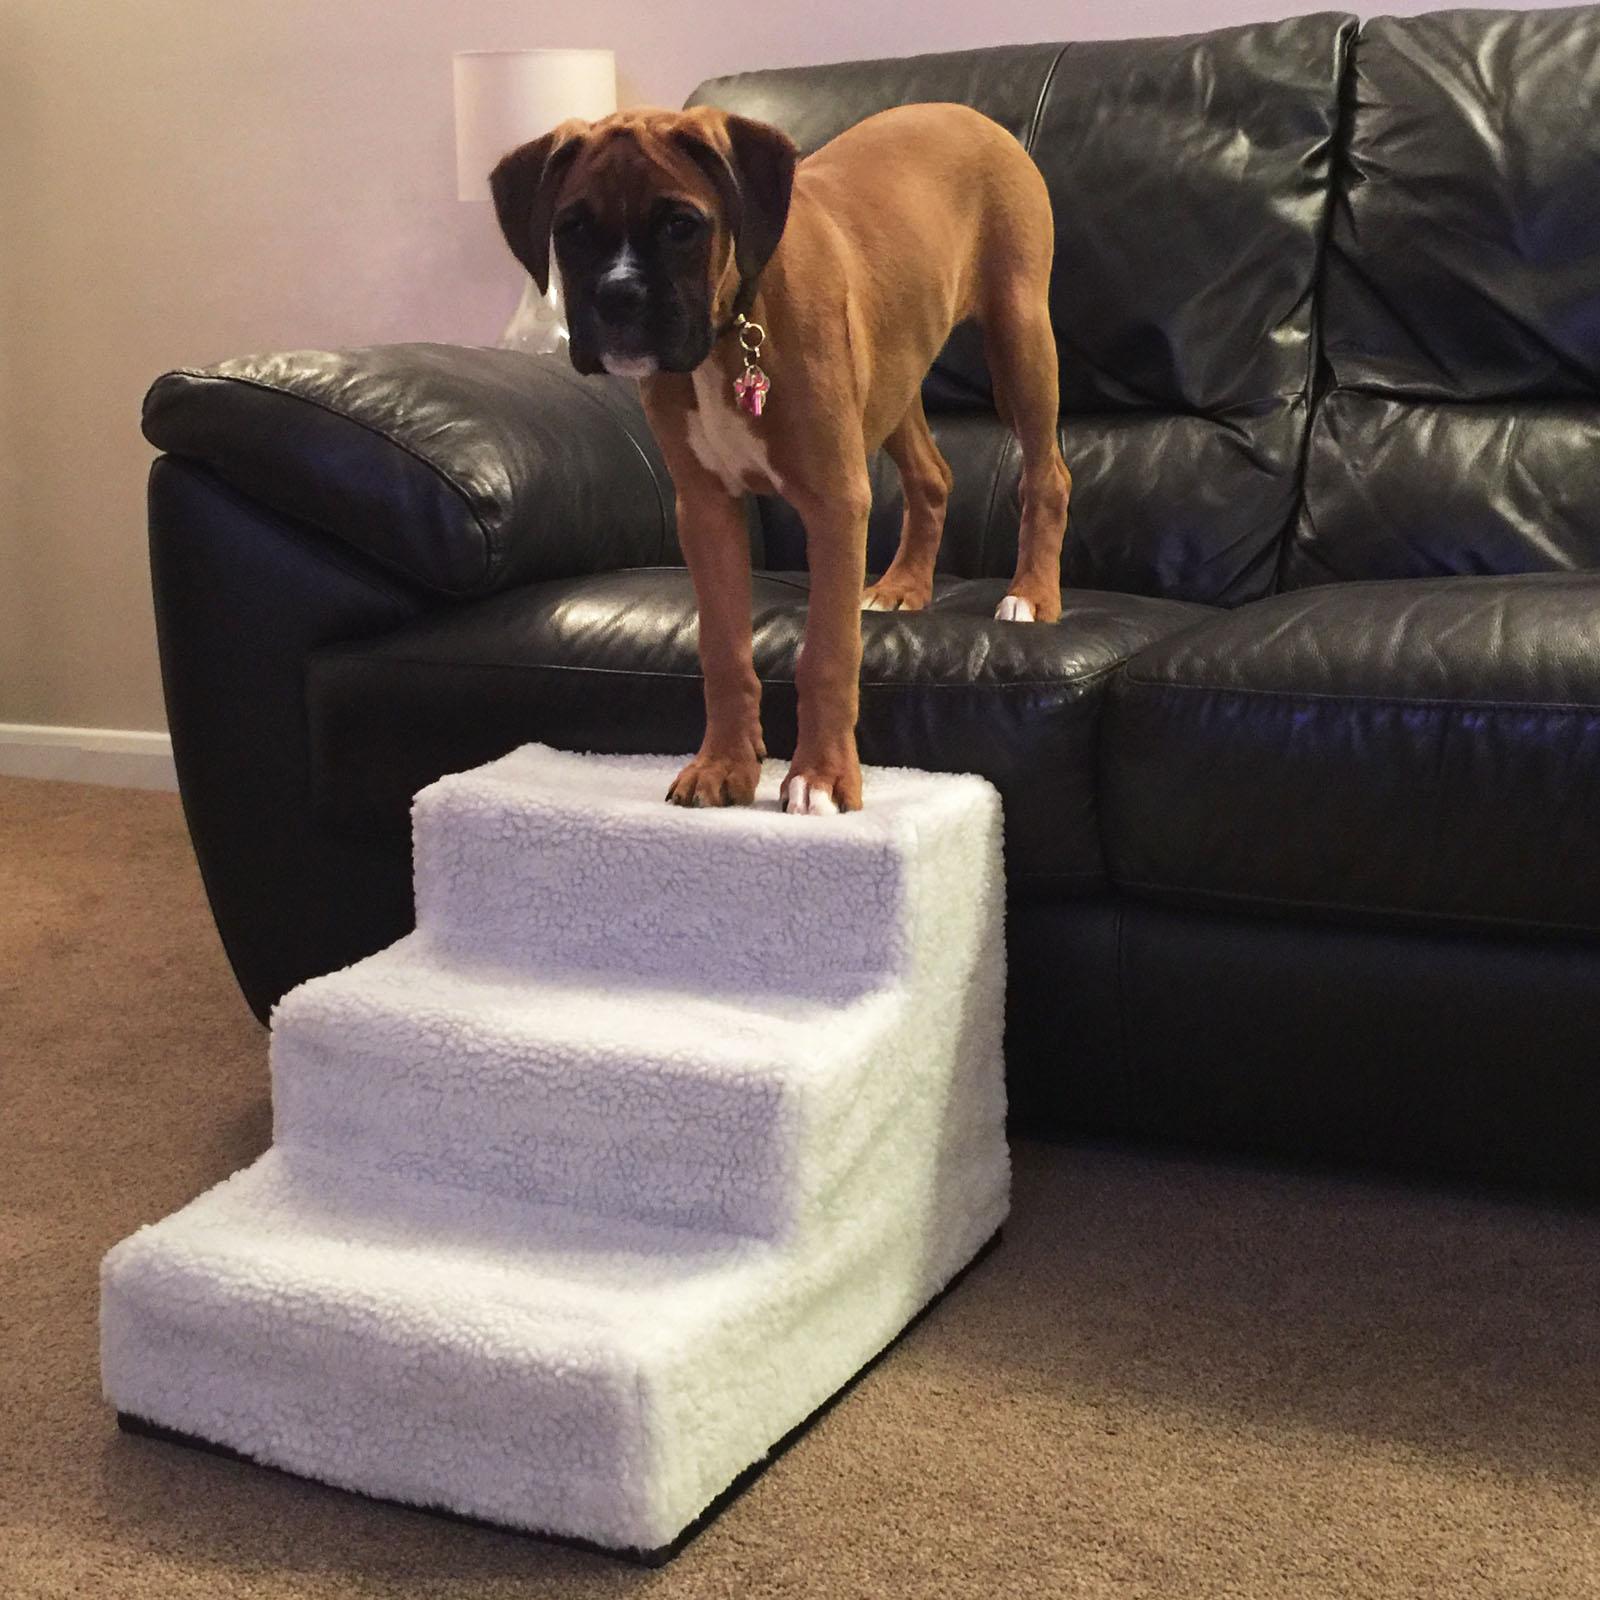 Pet Ramp For Car >> ME & MY BLACK EASY CLIMB PLASTIC PET STAIRS DOG/CAT STEP ...